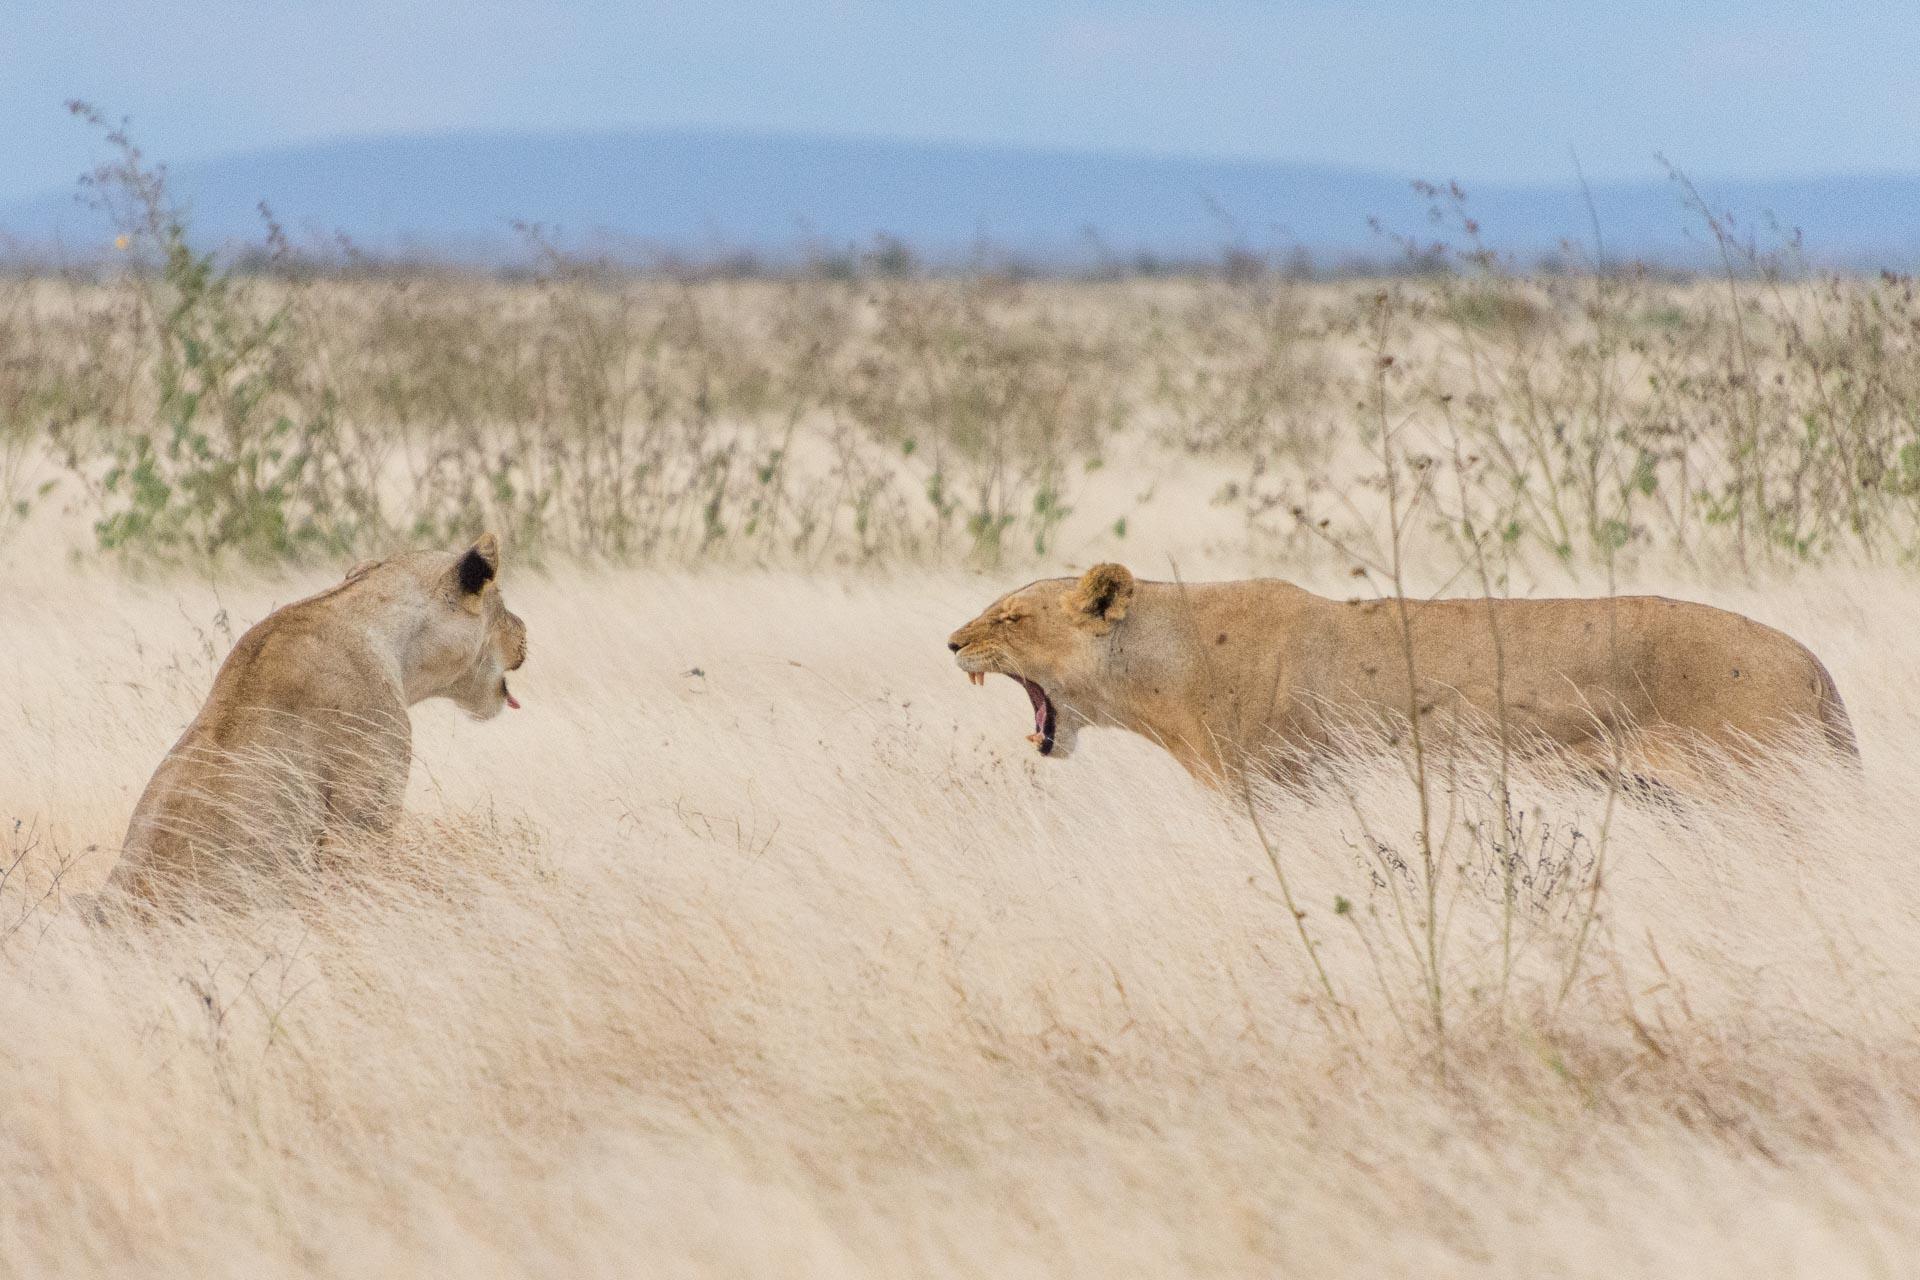 Loewen-Tsavo-Nationalpark-Kenia-Globetrotter-Select-3